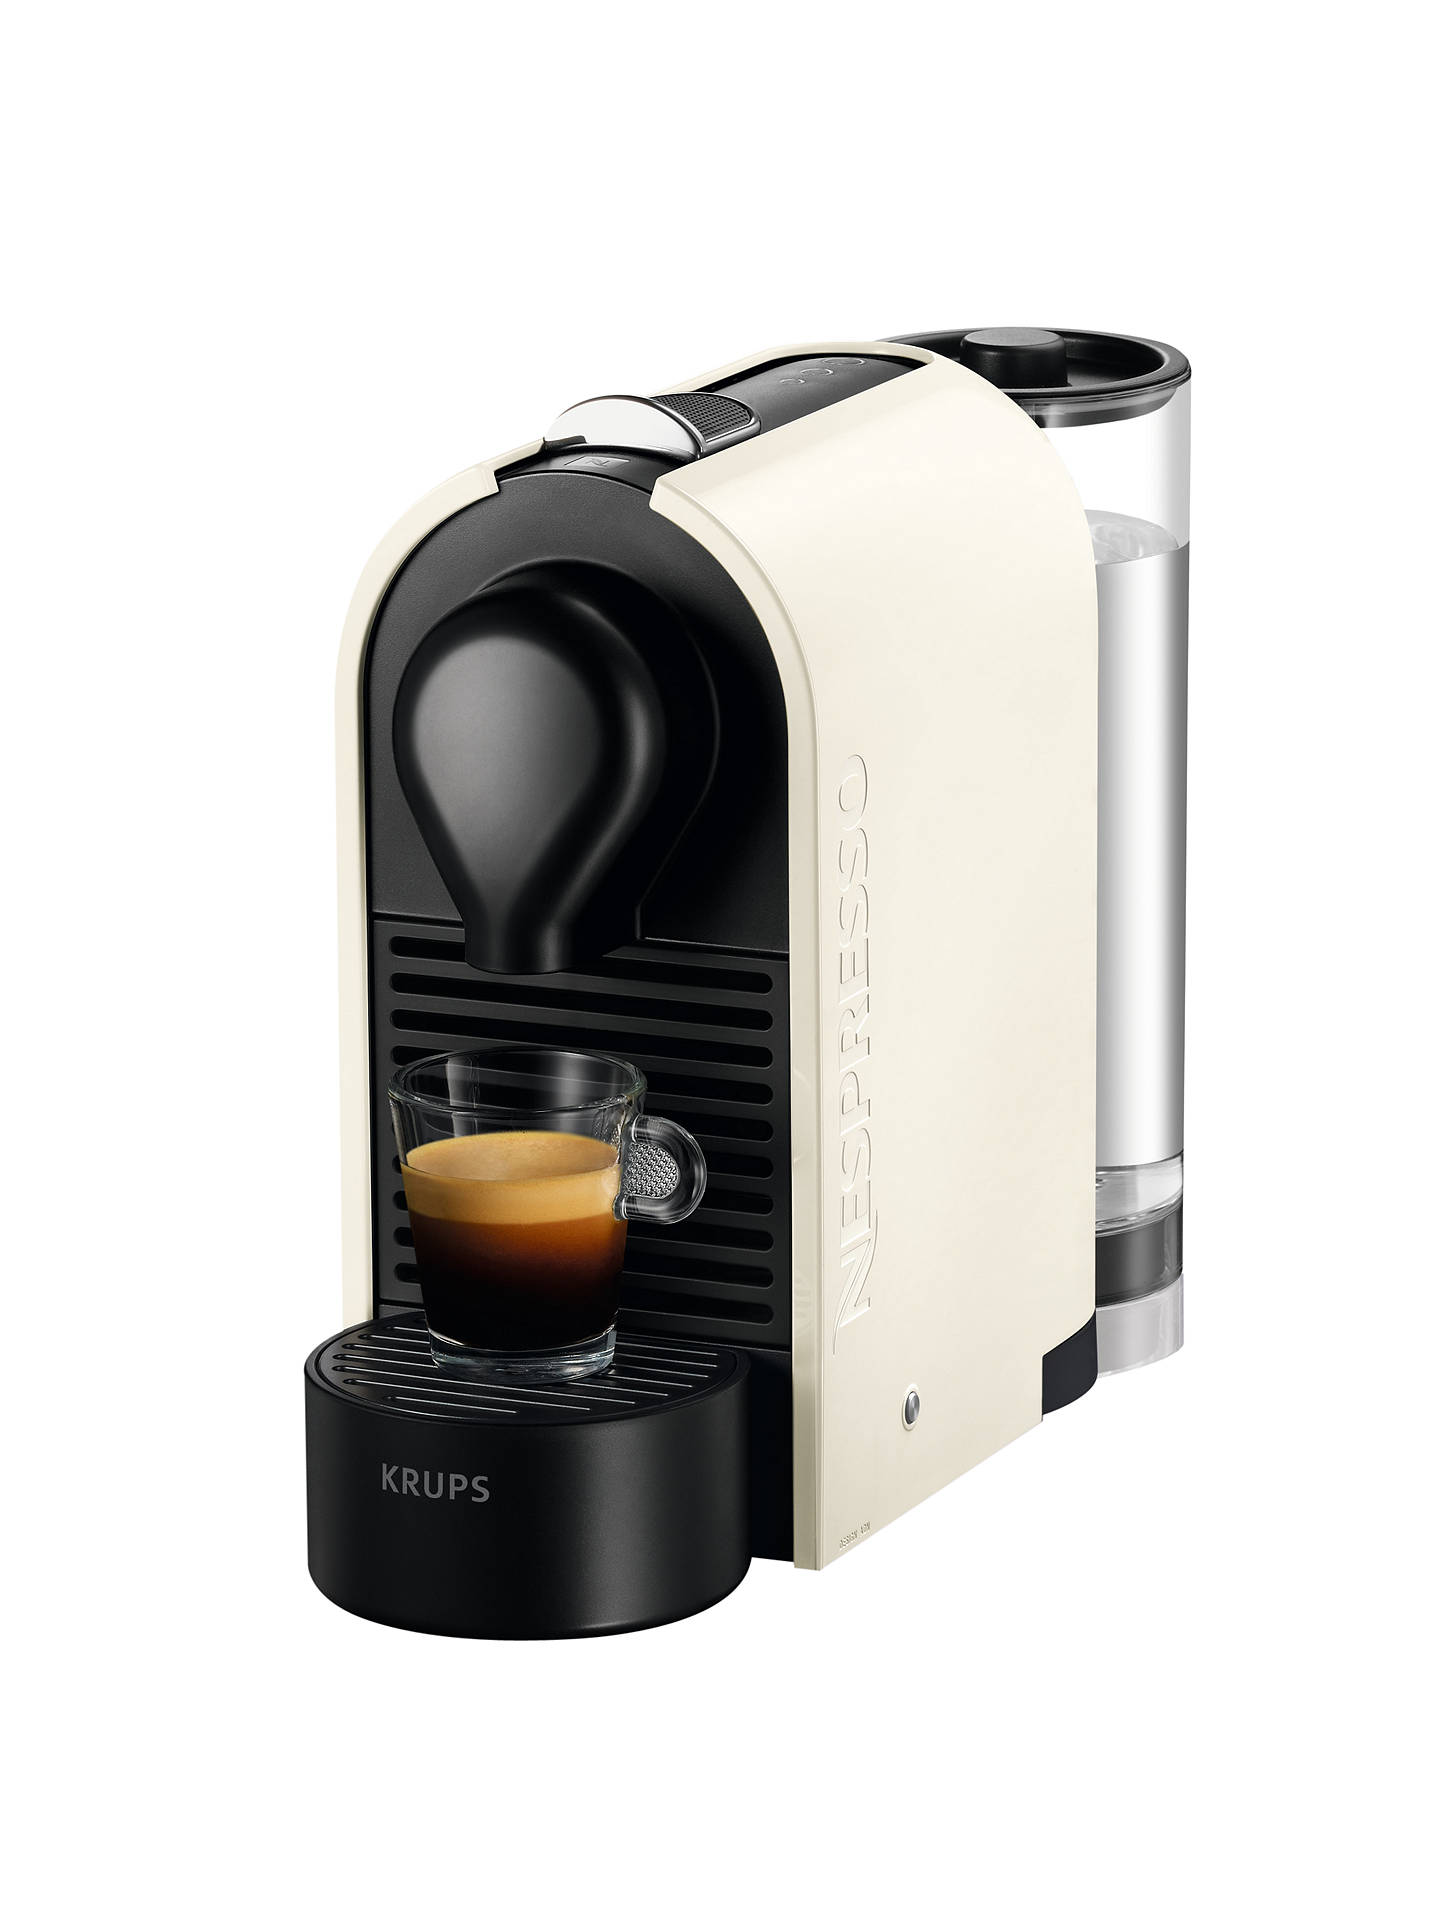 nespresso u coffee machine by krups at john lewis partners. Black Bedroom Furniture Sets. Home Design Ideas